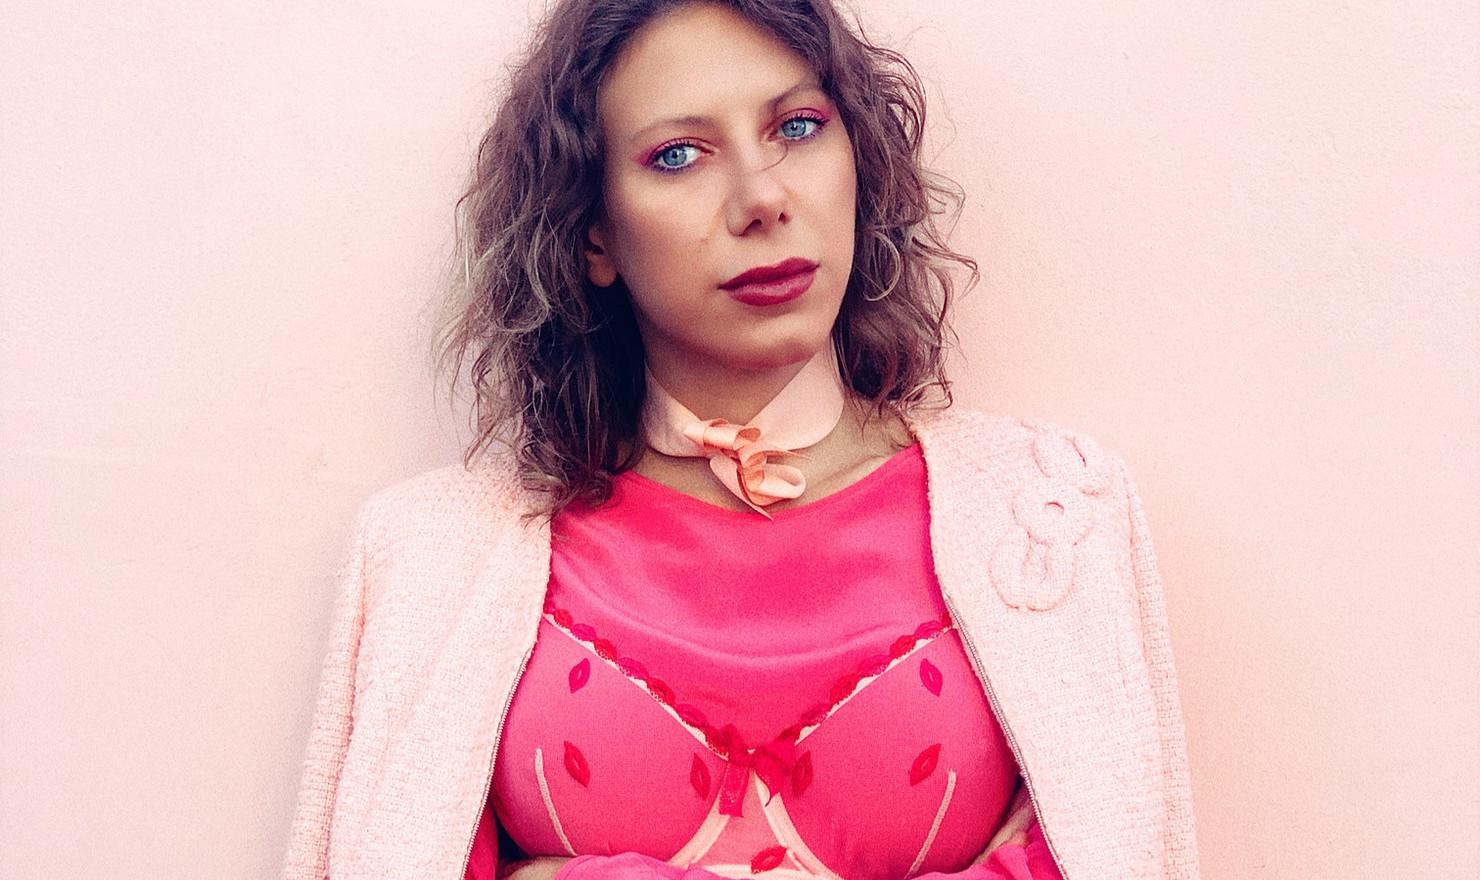 Interview With Italian Fashion Designer and Writer Marella Campagna